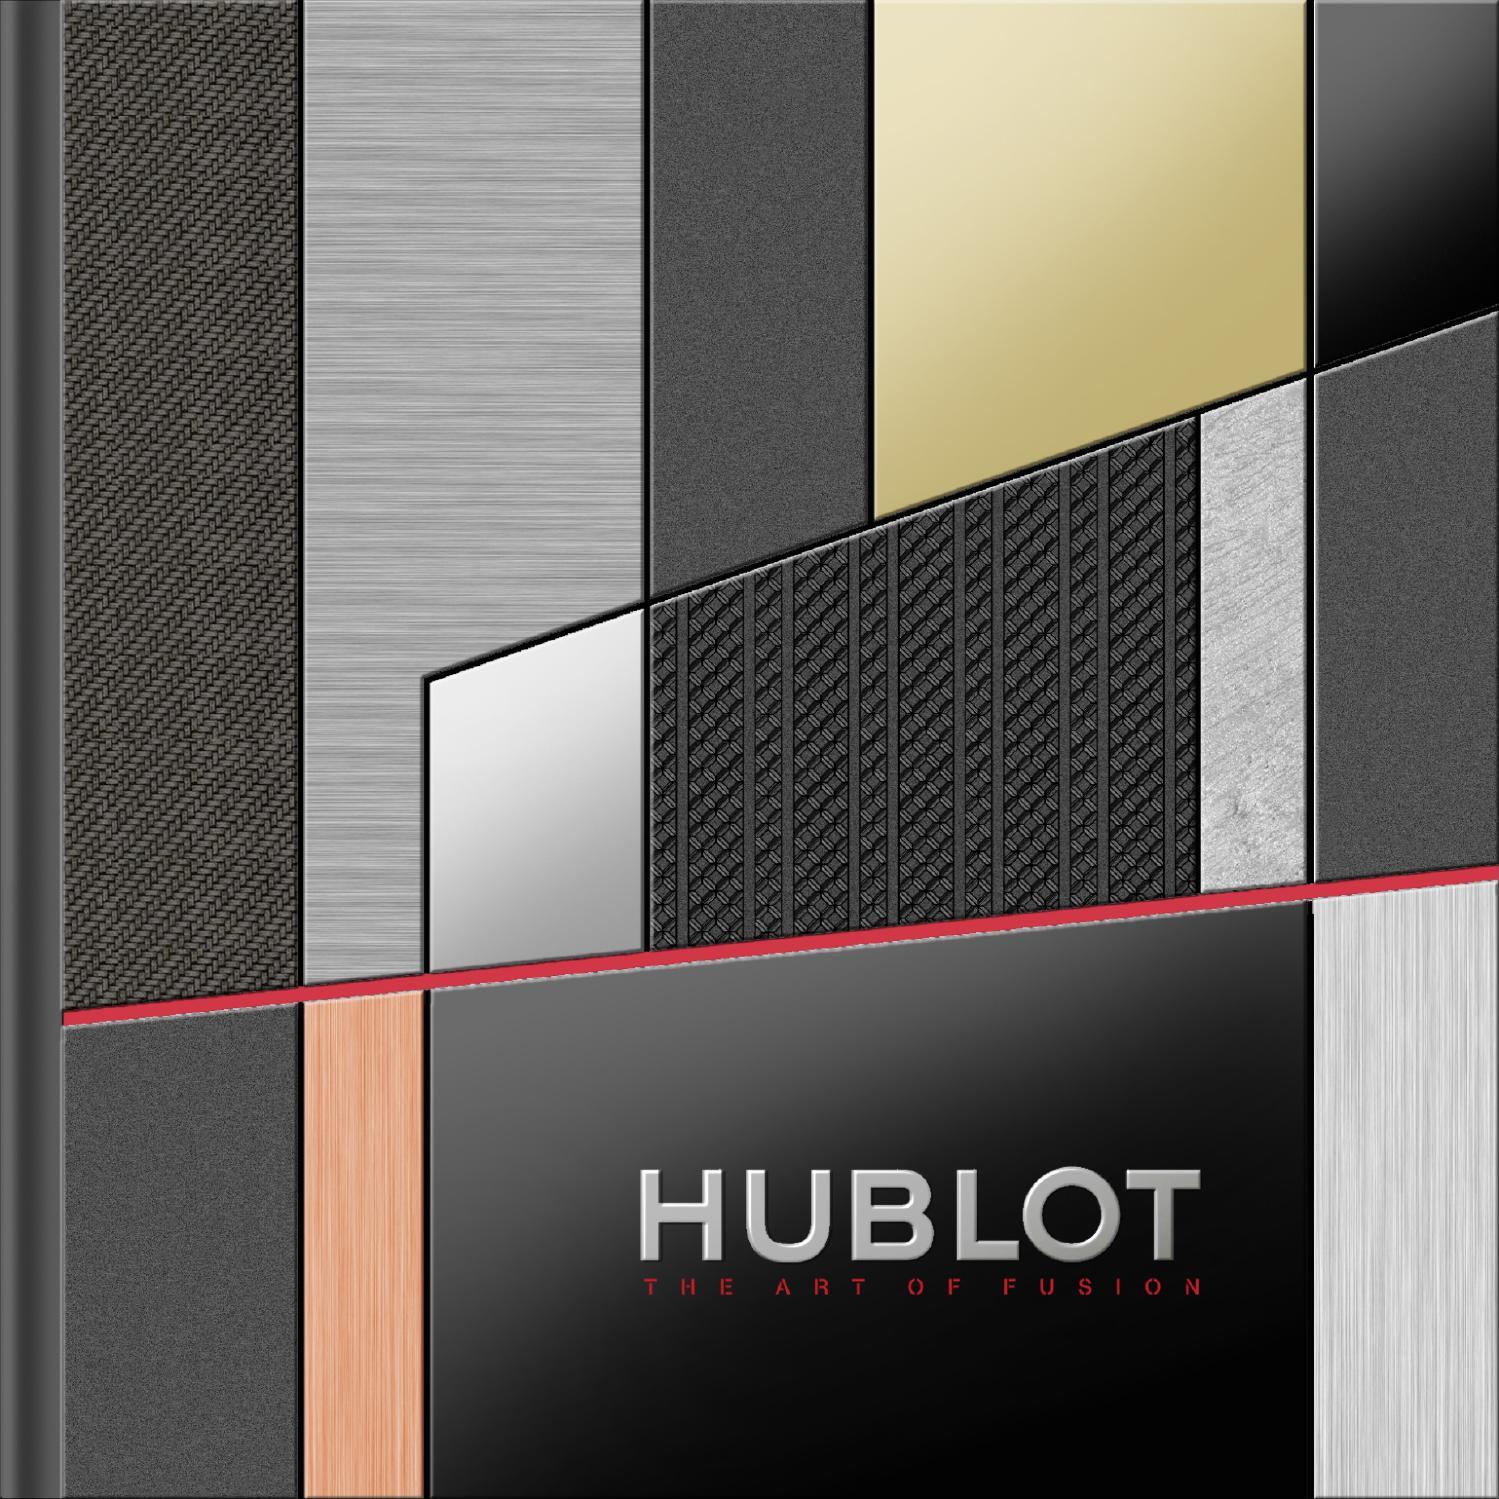 Hublot 2019 Catalog by Hublot - issuu